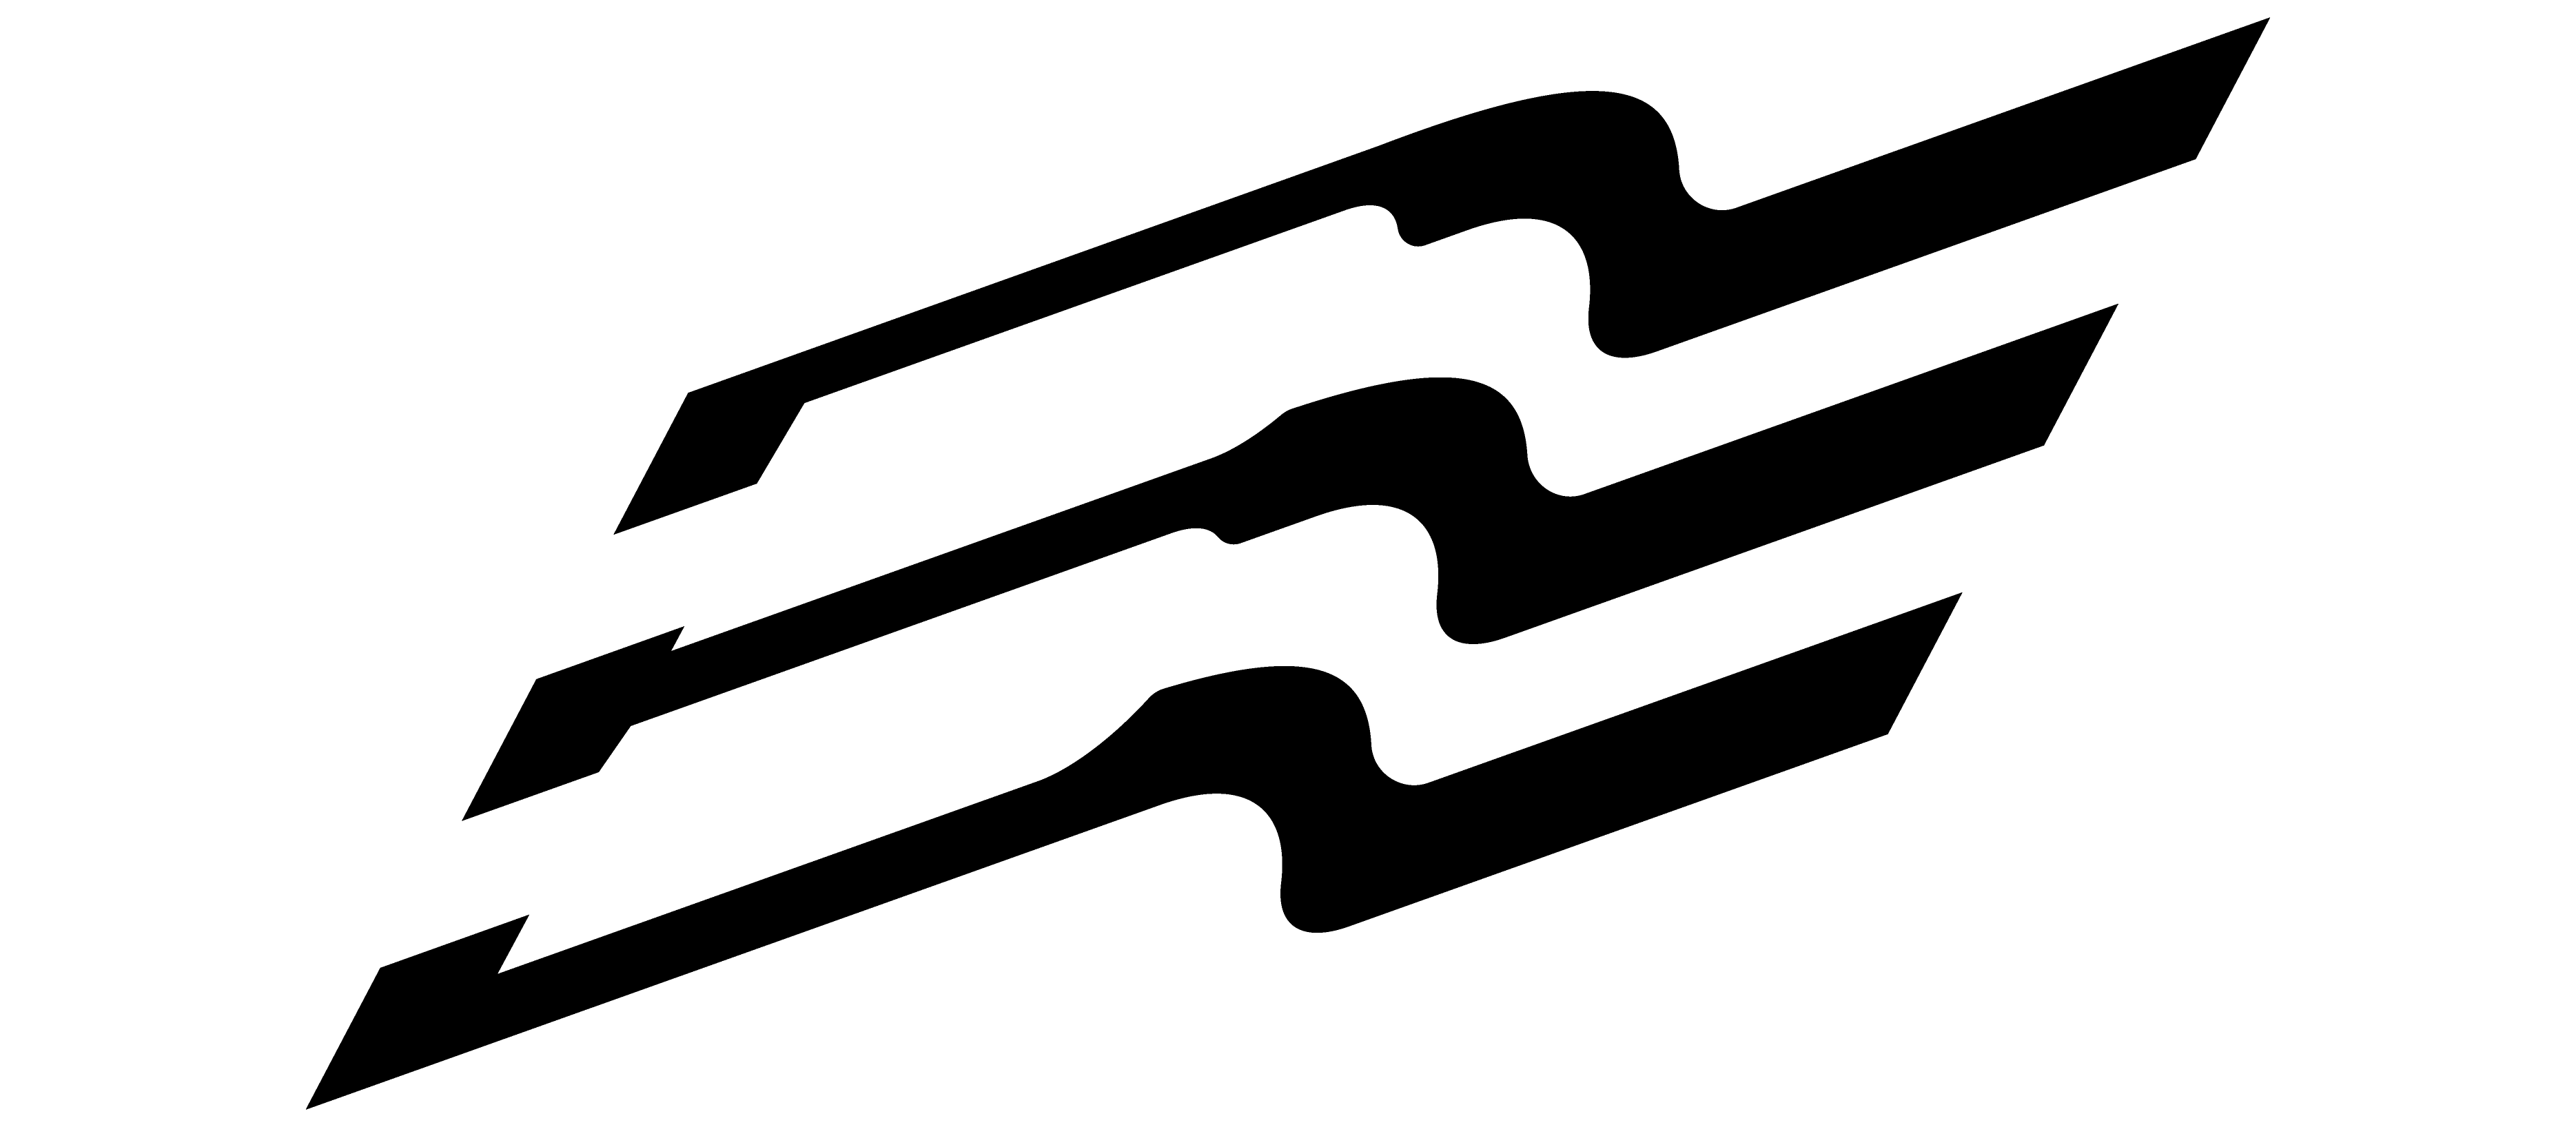 Beyond Lines Icon Logo